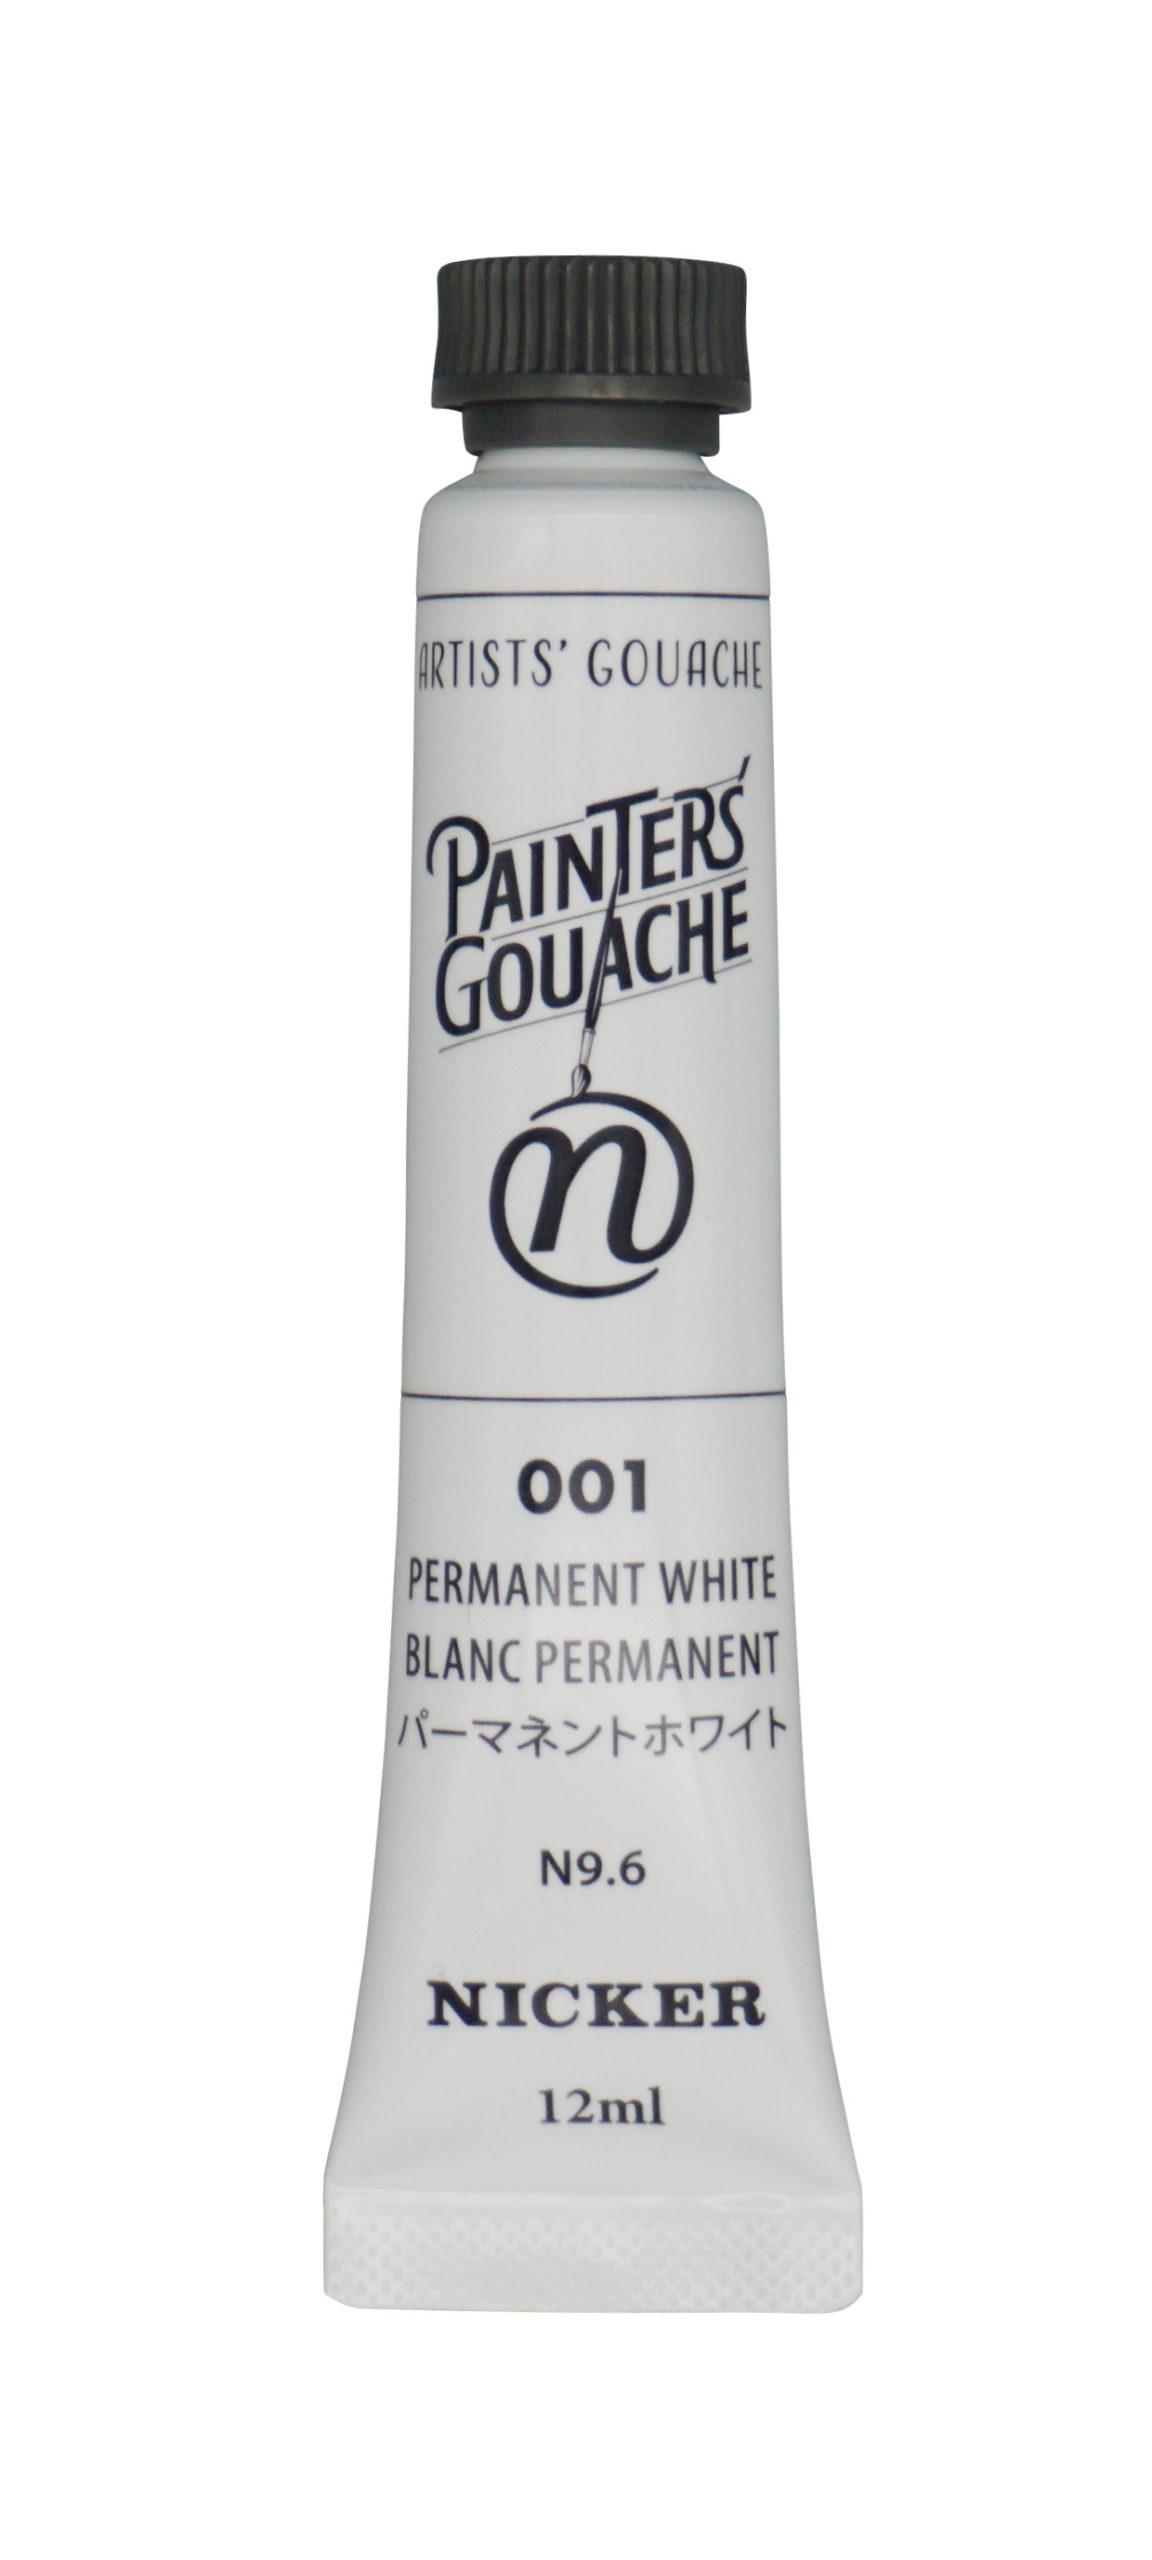 PAINTER'S GOUACHE PERMANENT WHITE